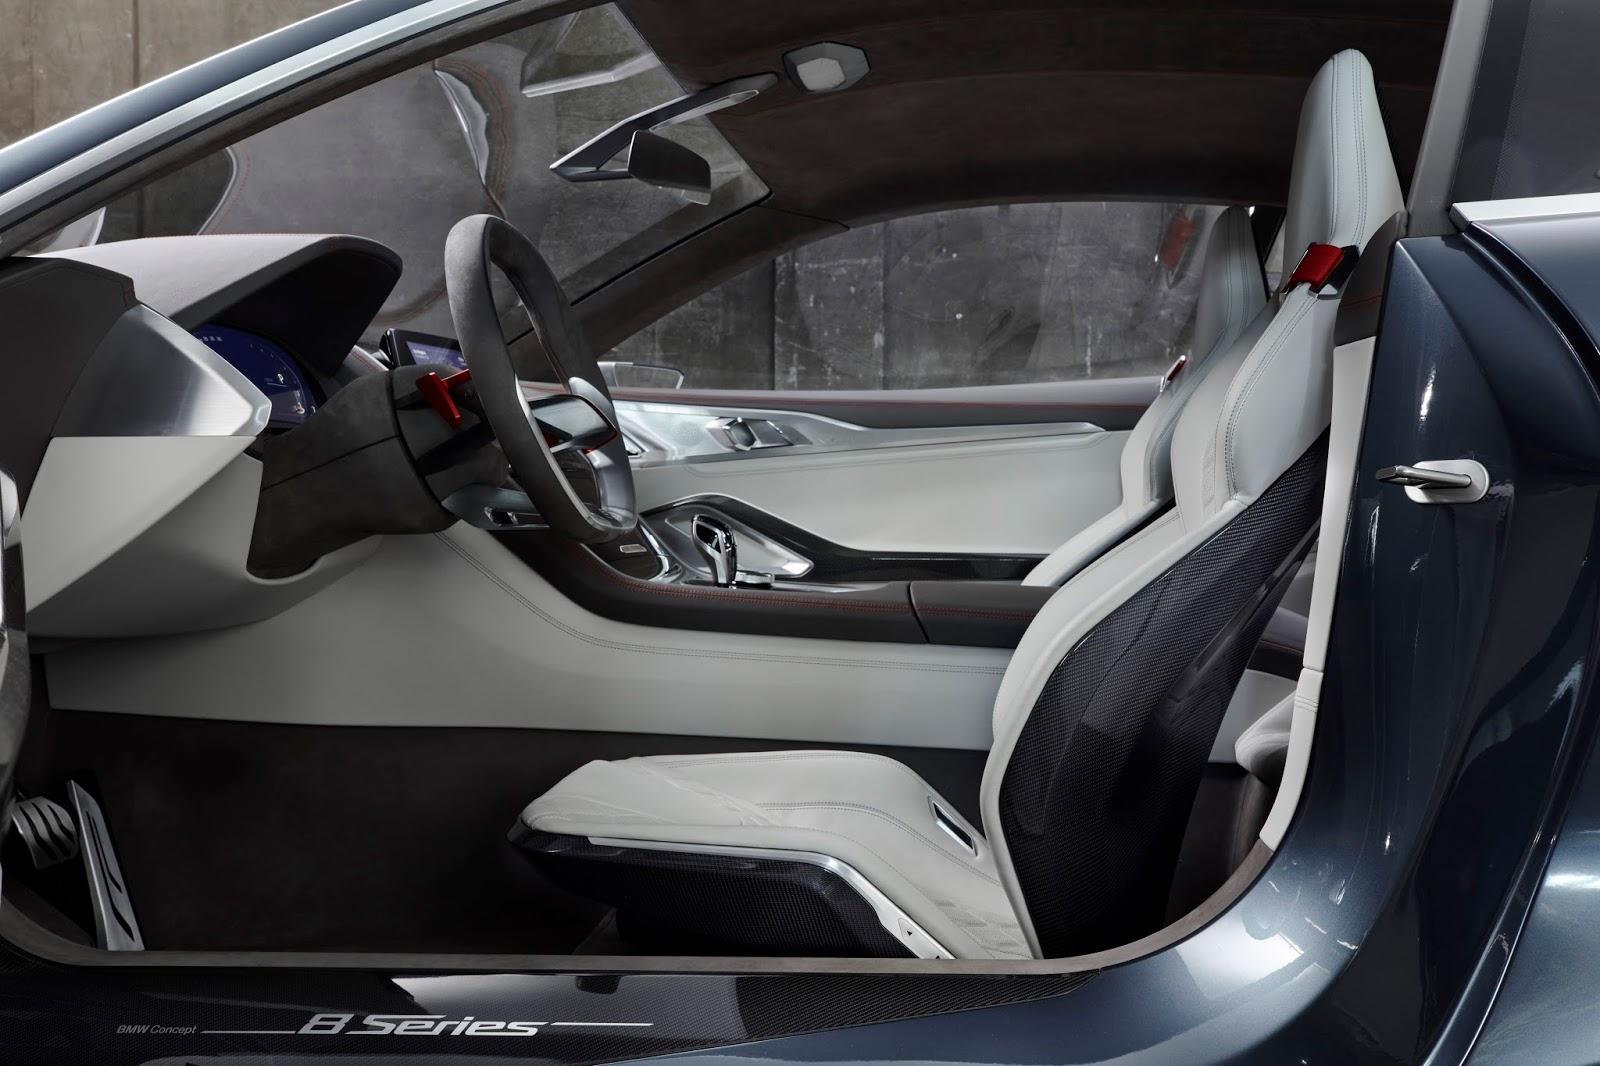 P90261132 highRes bmw concept 8 series Η BMW Σειρά 8 Coupe είναι η πεμπτουσία των μελλοντικών σπορ αυτοκινήτων BMW, BMW 8, BMW Concept, BMW Concept 8 Series, COUPE, dream car